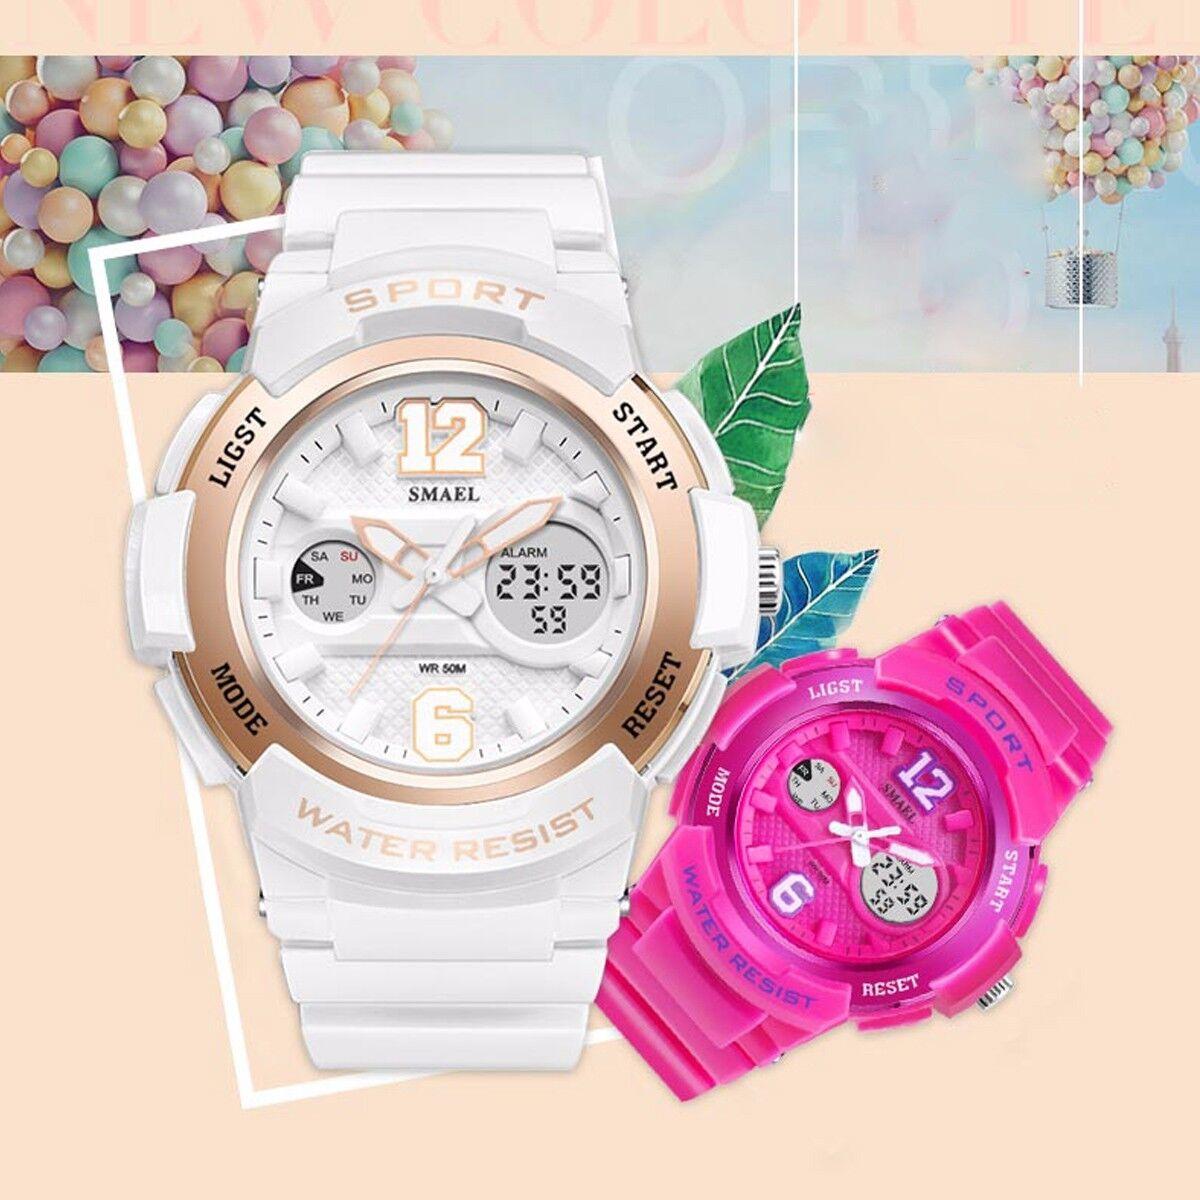 Sport Digital Analog Waterproof LED Quartz Watch Alarm for W